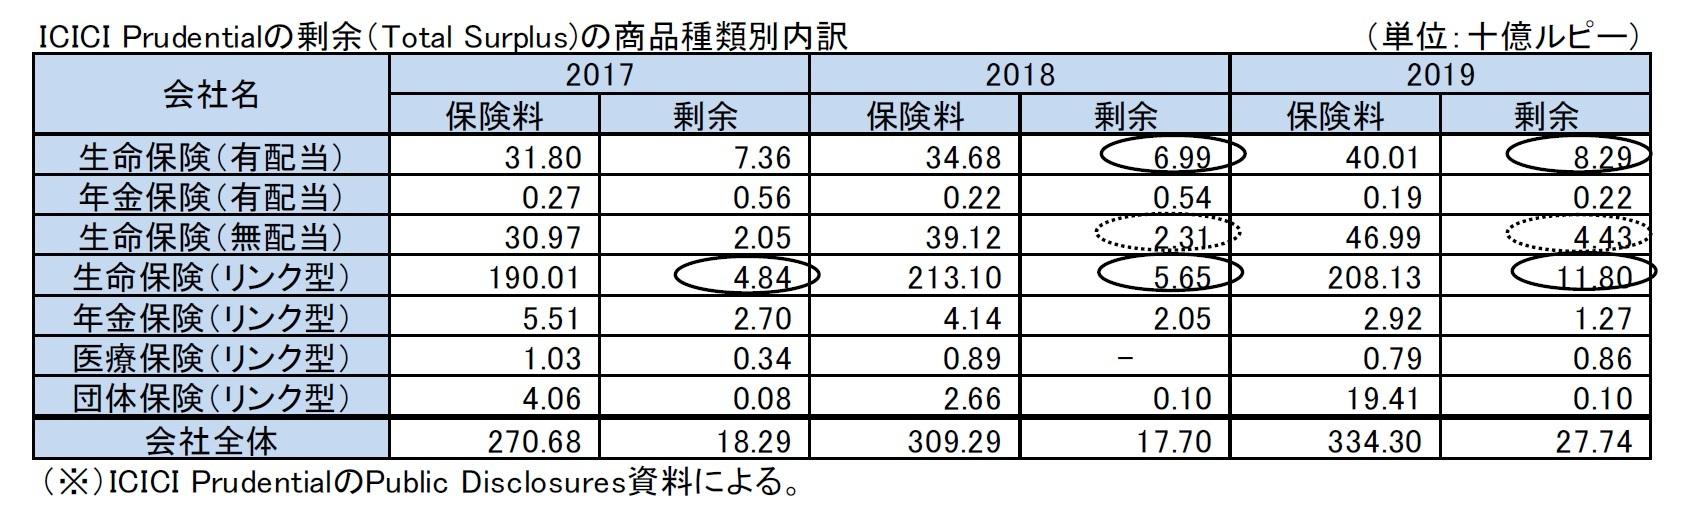 ICICI Prudentialの剰余(Total Surplus)の商品種類別内訳